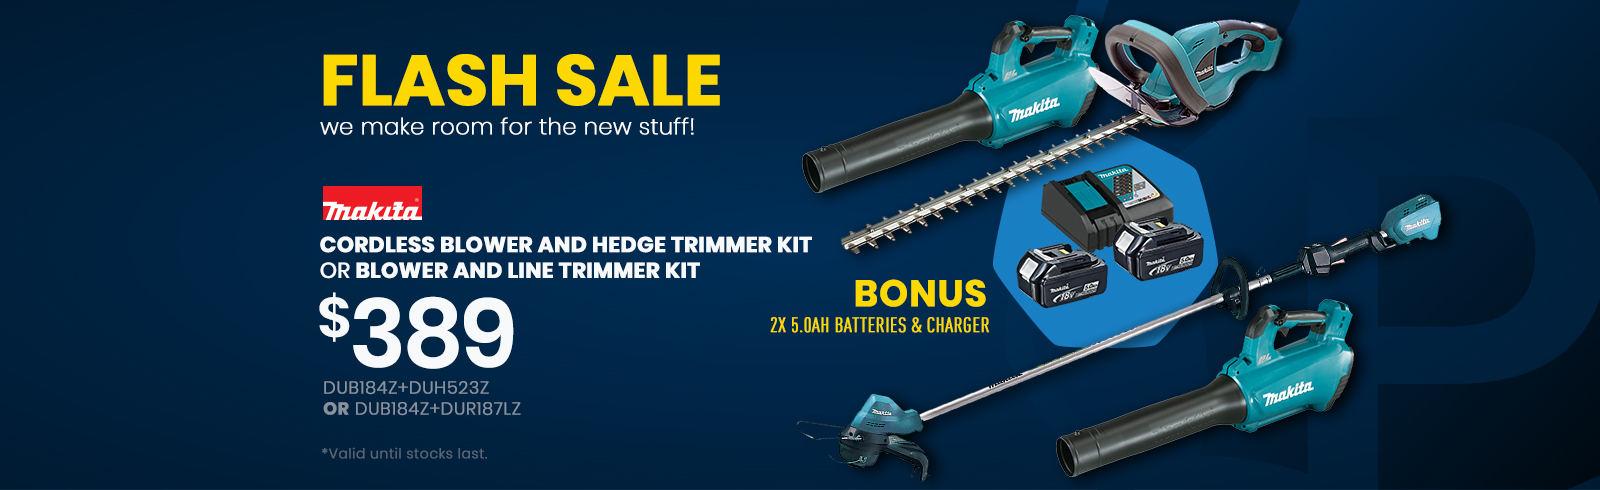 Flash Sale Makita Outdoor tools